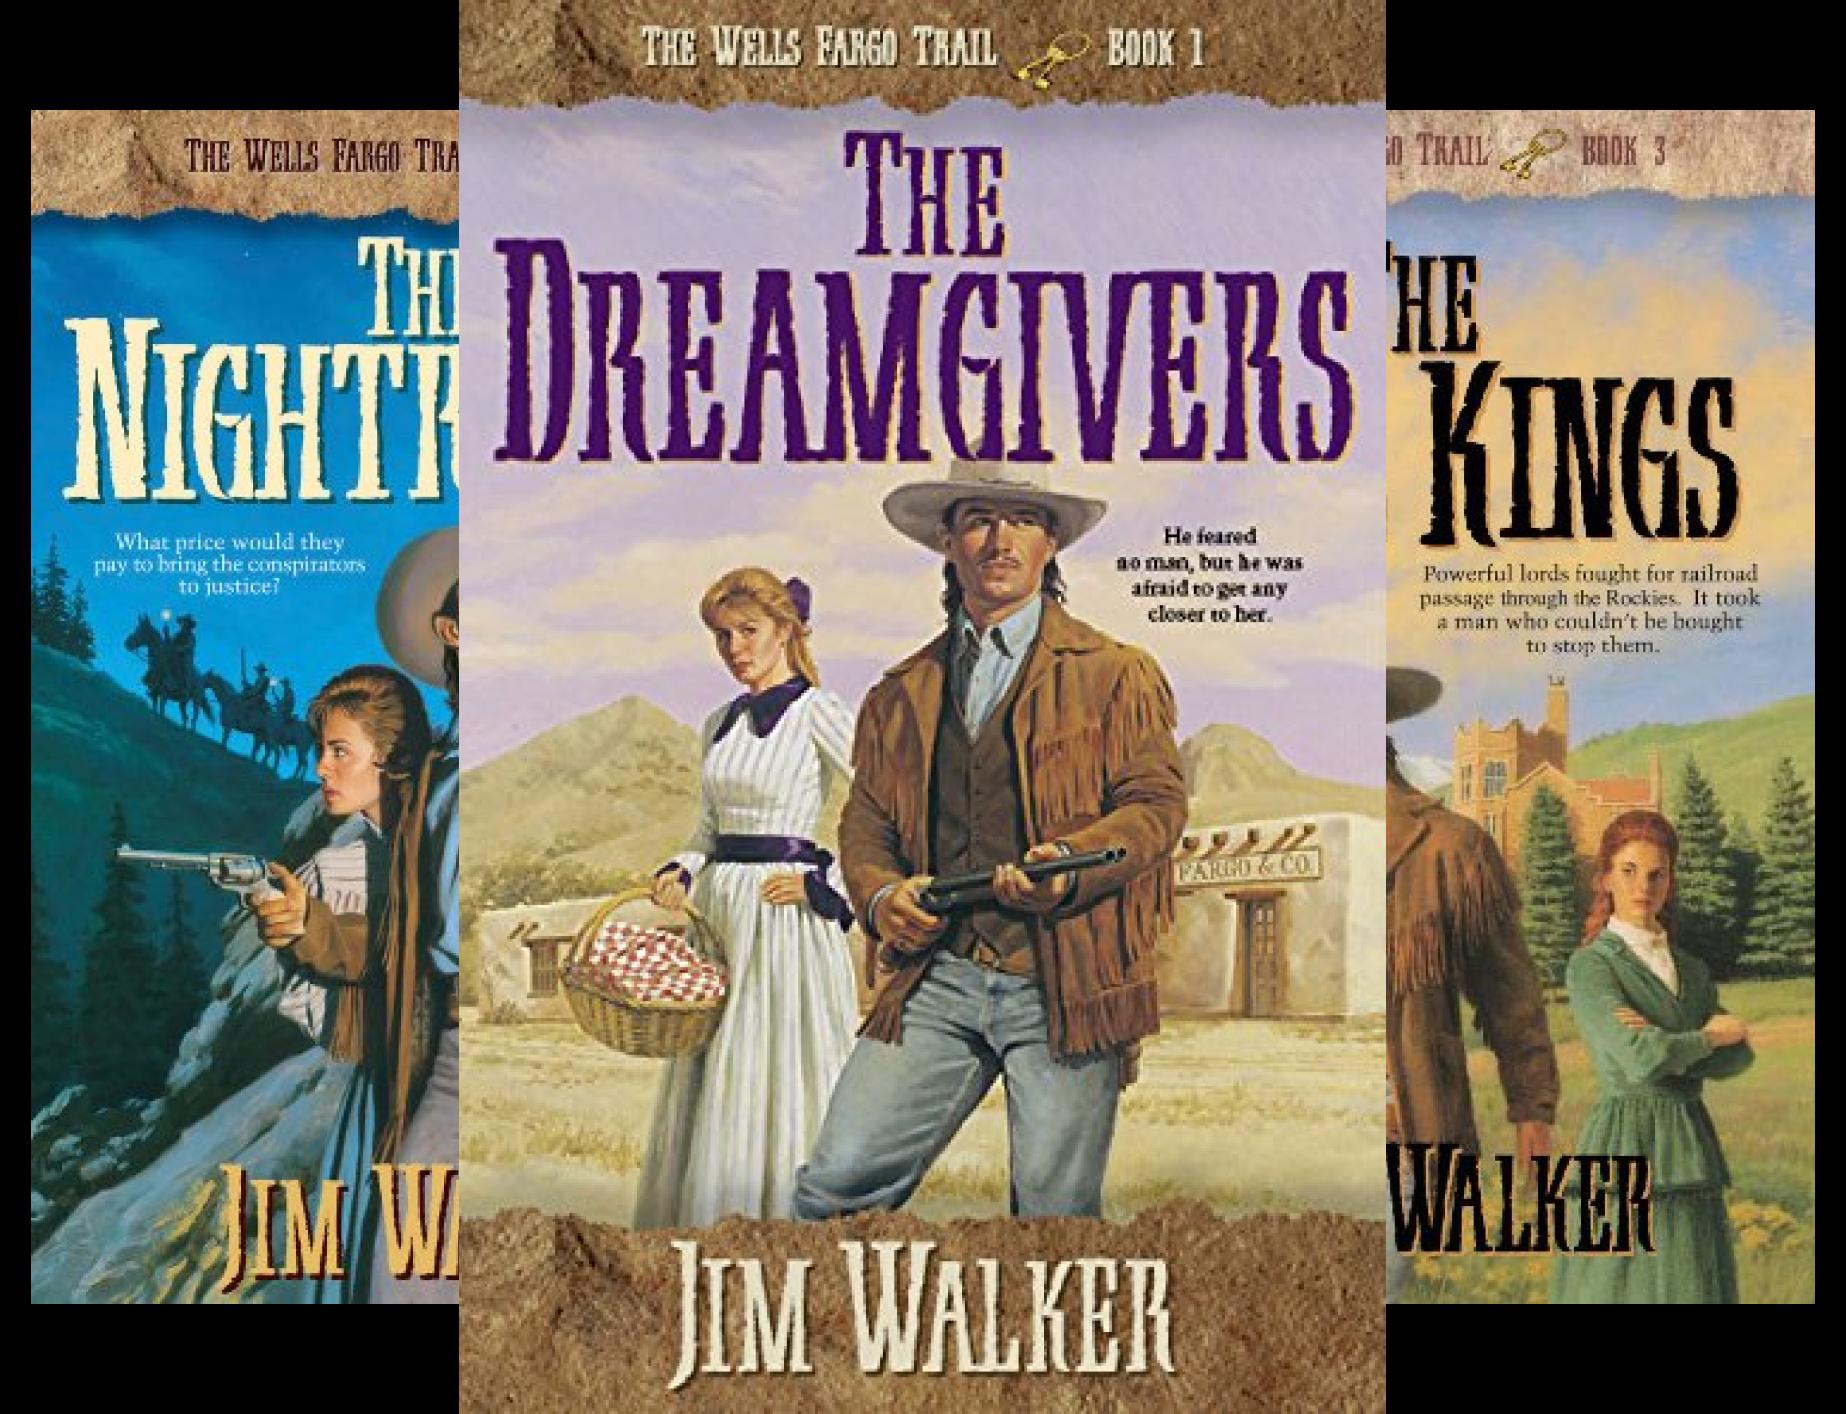 wells-fargo-trail-8-book-series